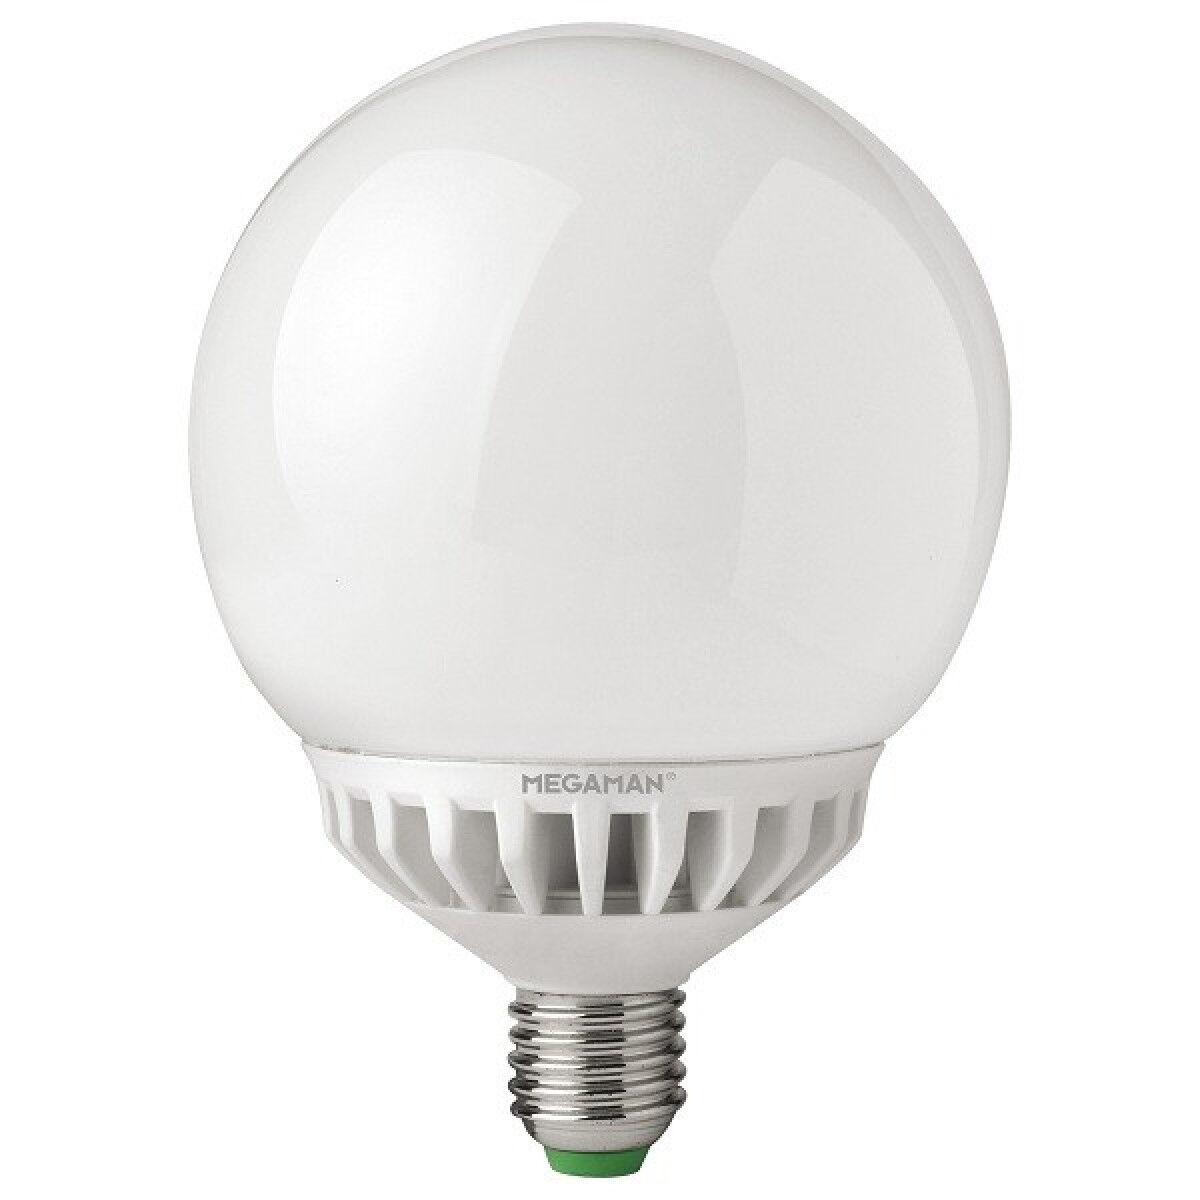 Megaman Lamppu LED 8W Globe E27 - Megaman